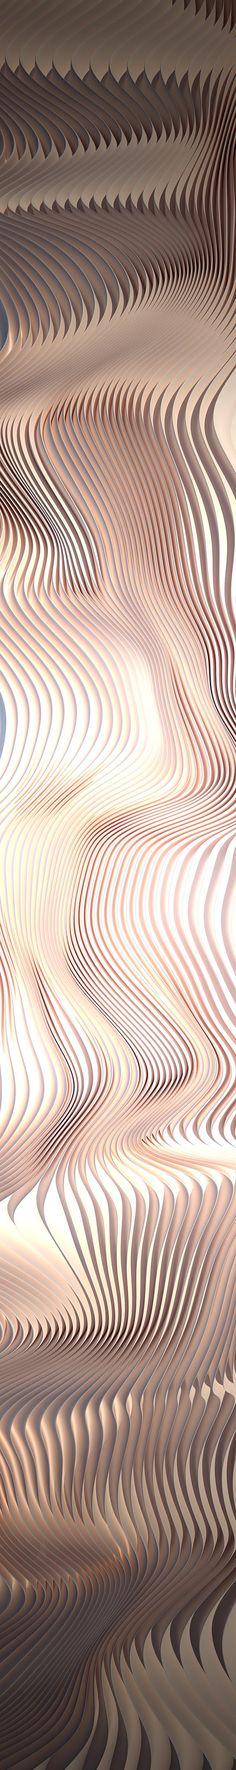 Parametric Surface designed by Yunus Emre Kara